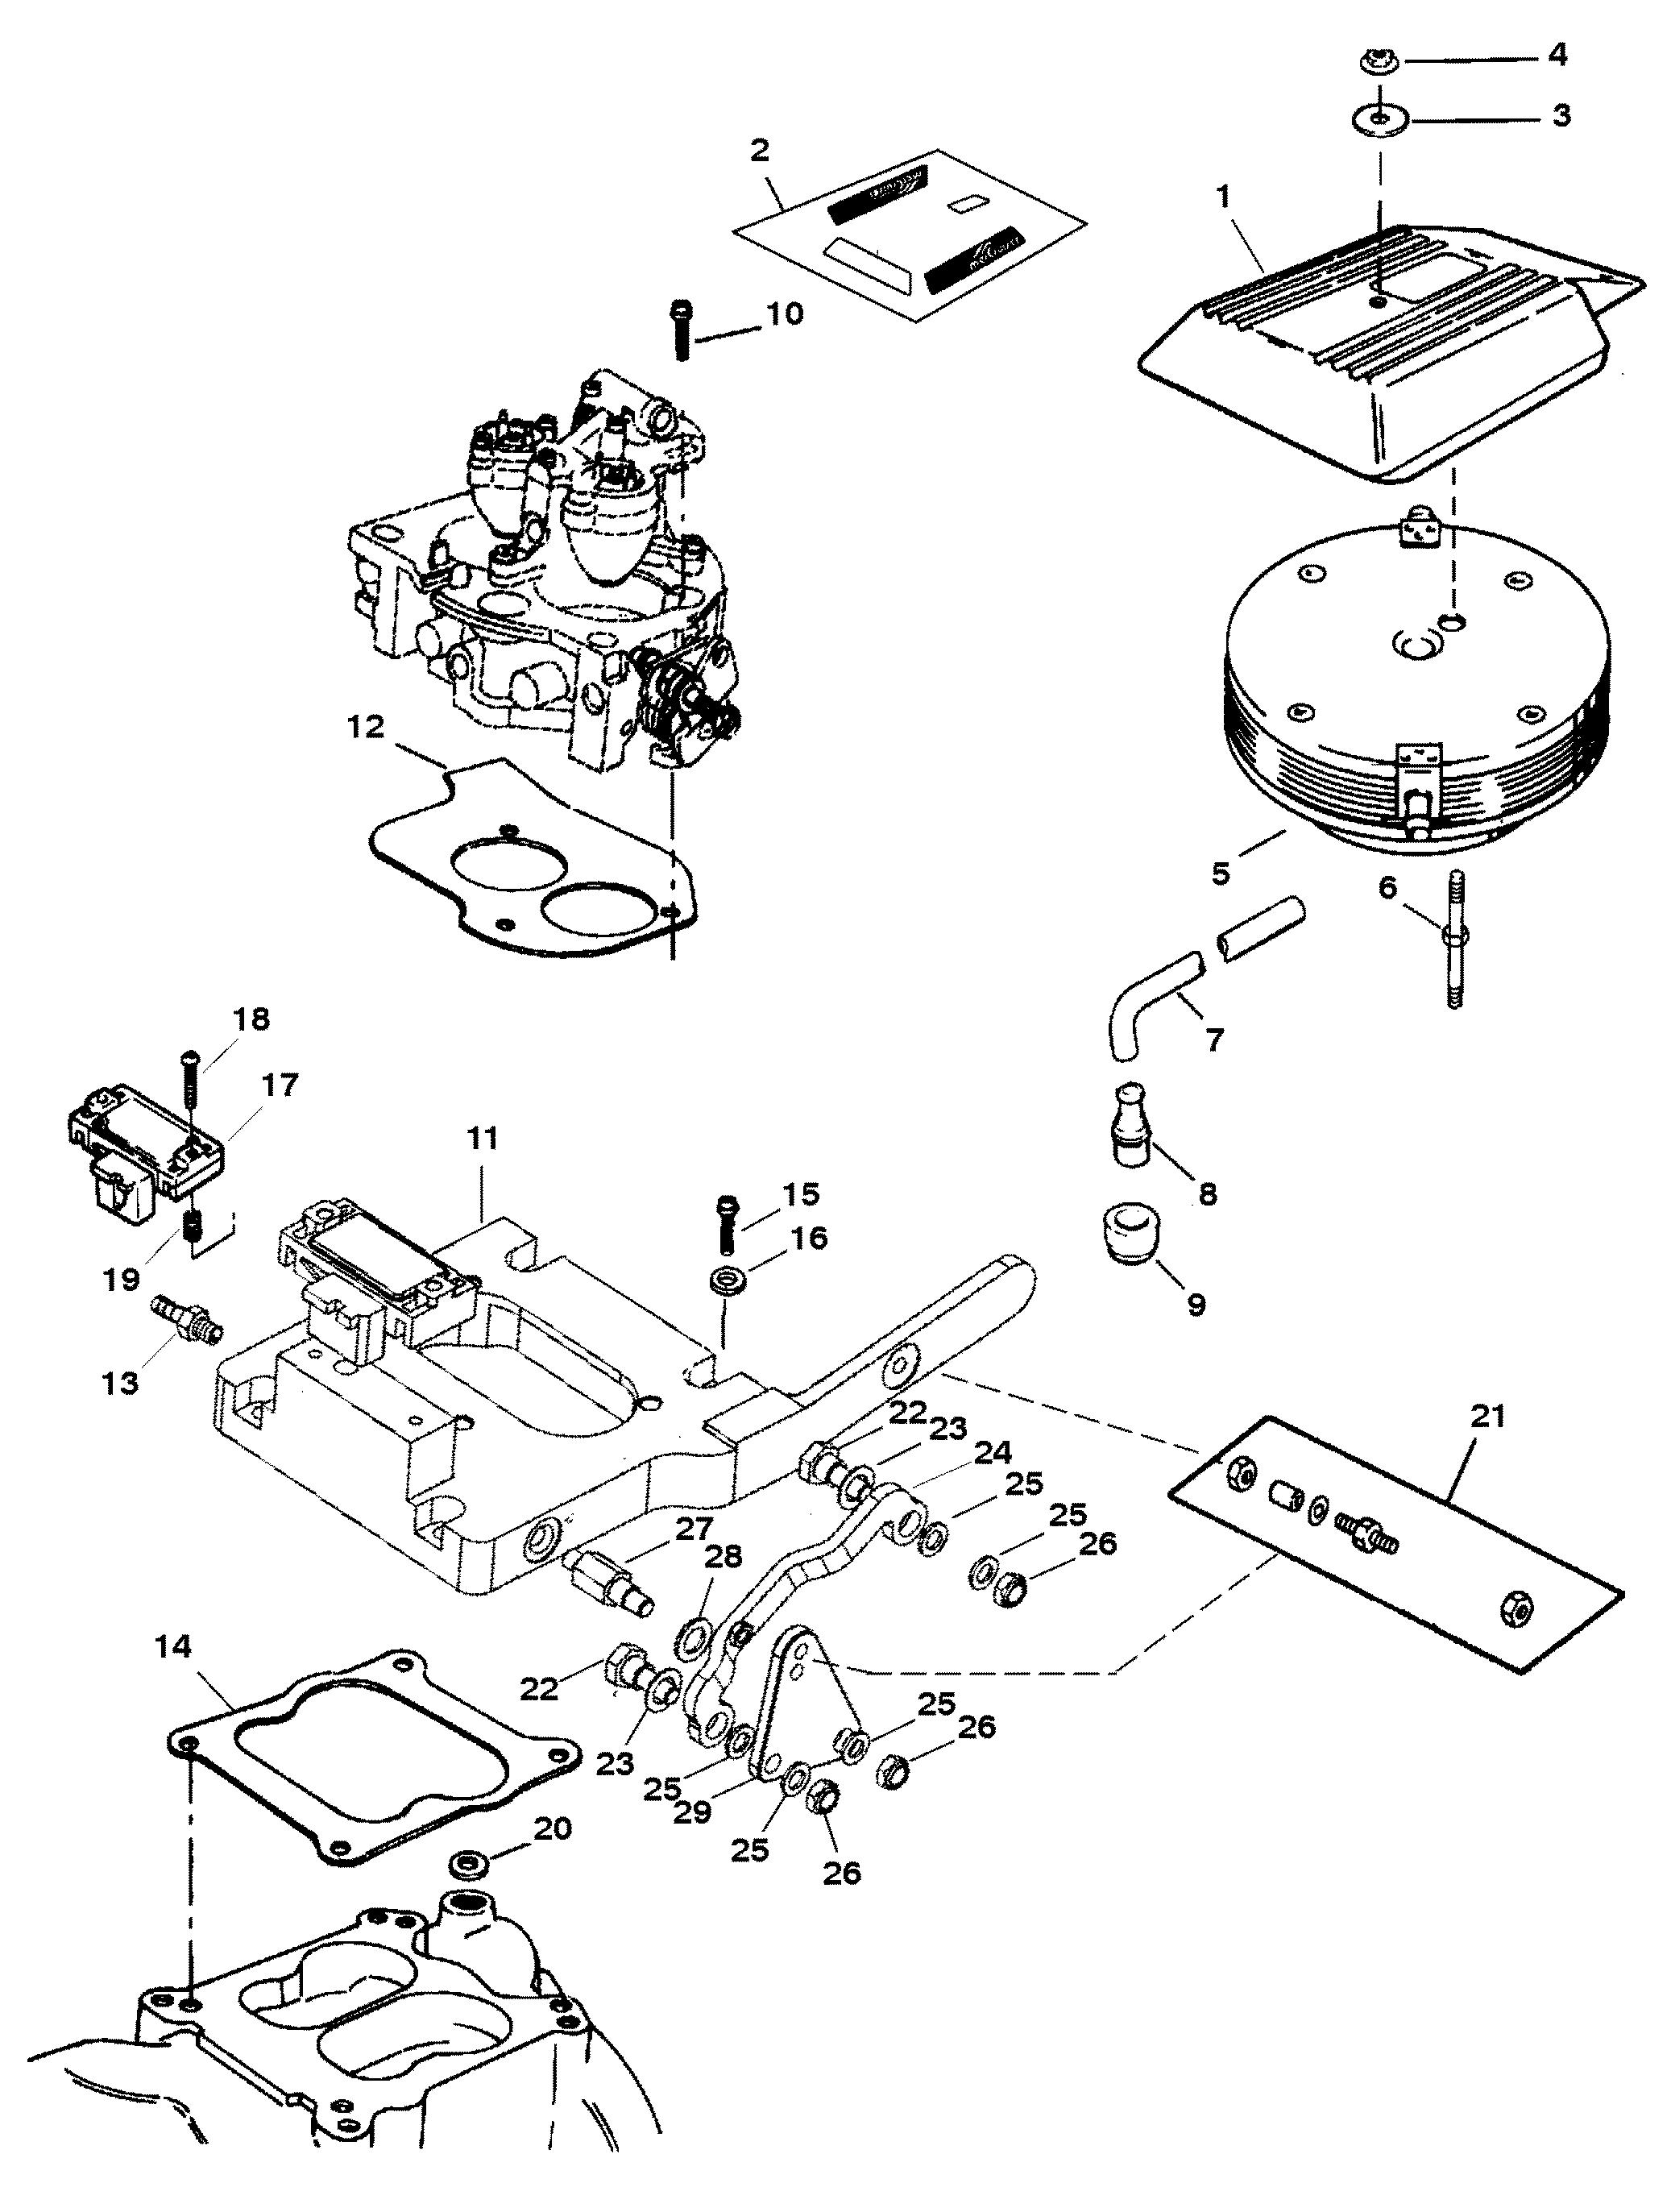 mercruiser 5 7 alternator wiring diagram efcaviation